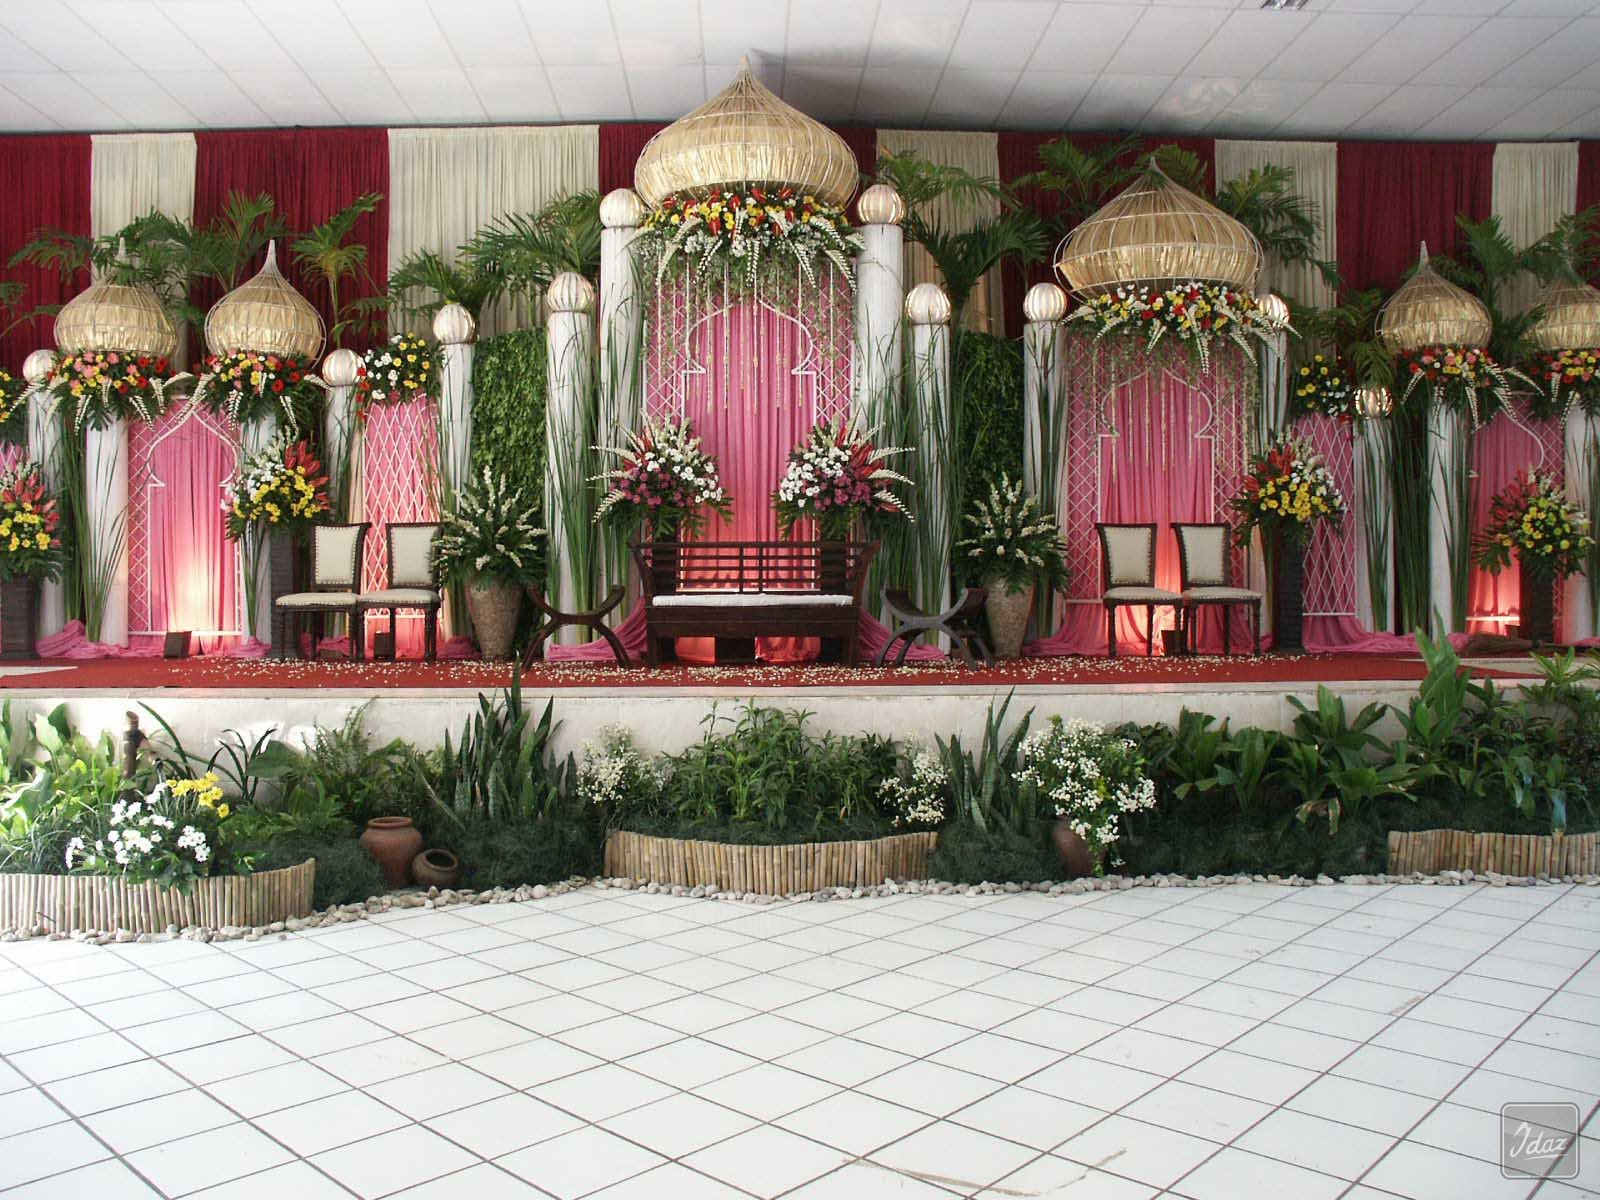 Dekorasi Pernikahan Islami Idaz | Idaz Dekorasi | Dekorasi Pelaminan